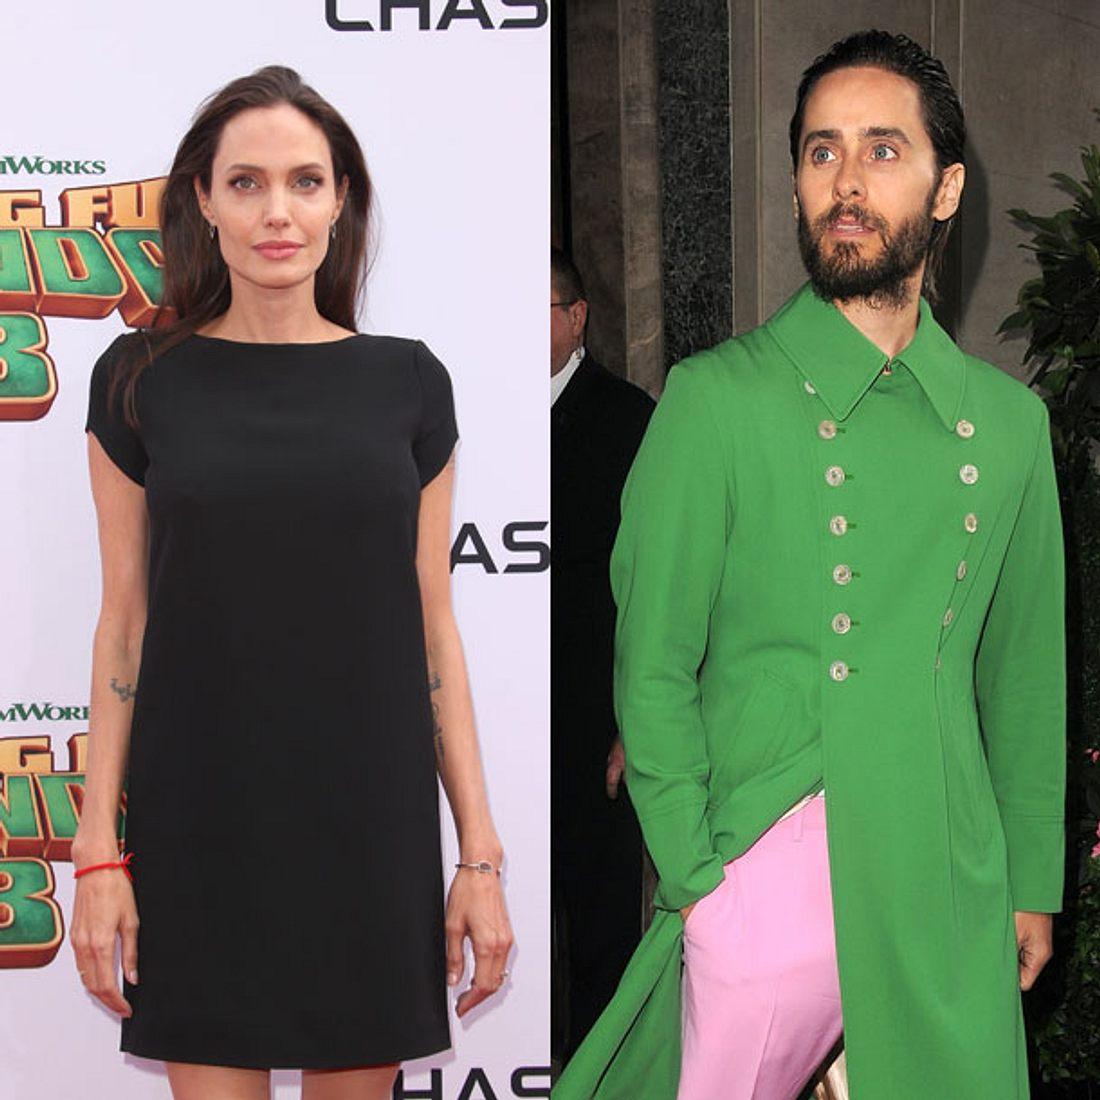 Angelina Jolie: Romanze mit Jared Leto?